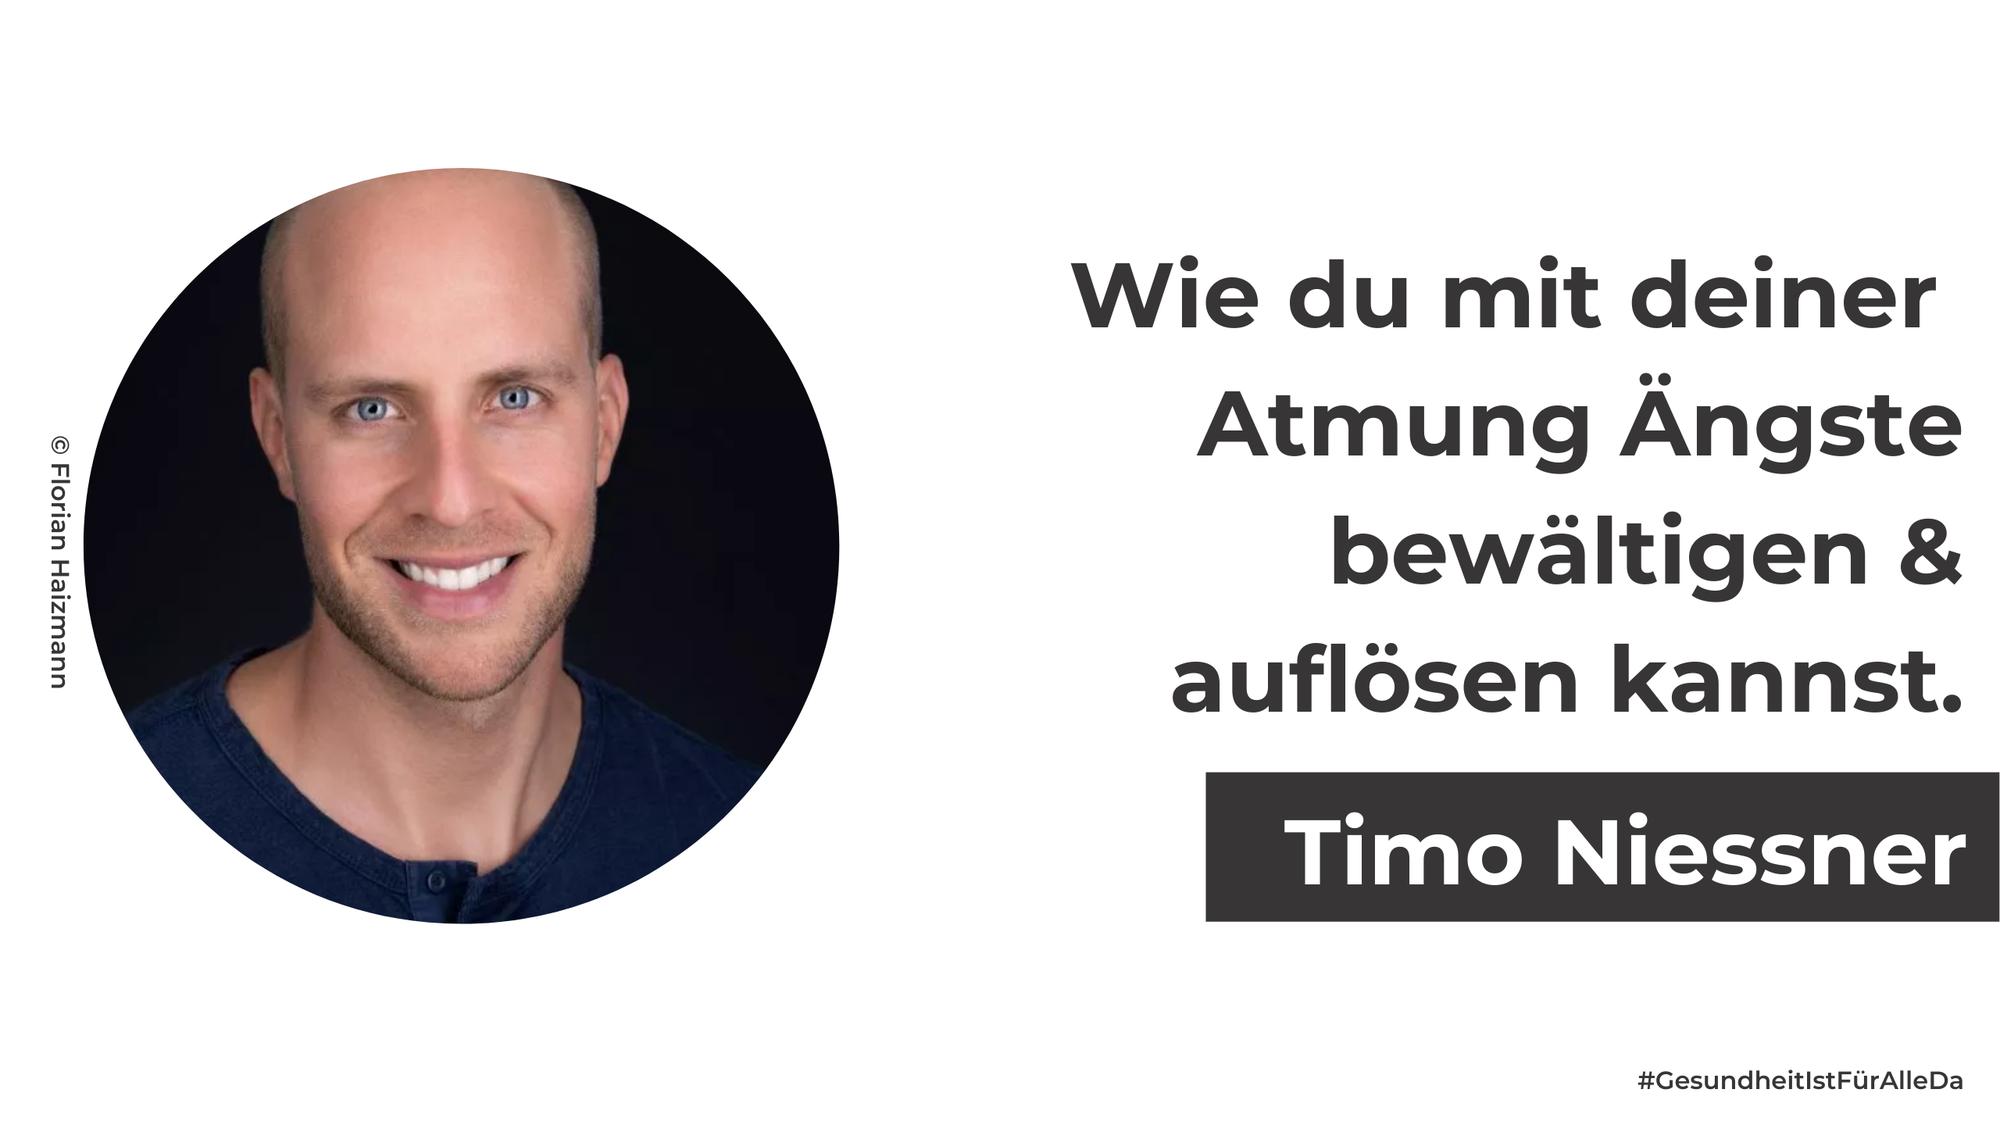 Timo Niessner